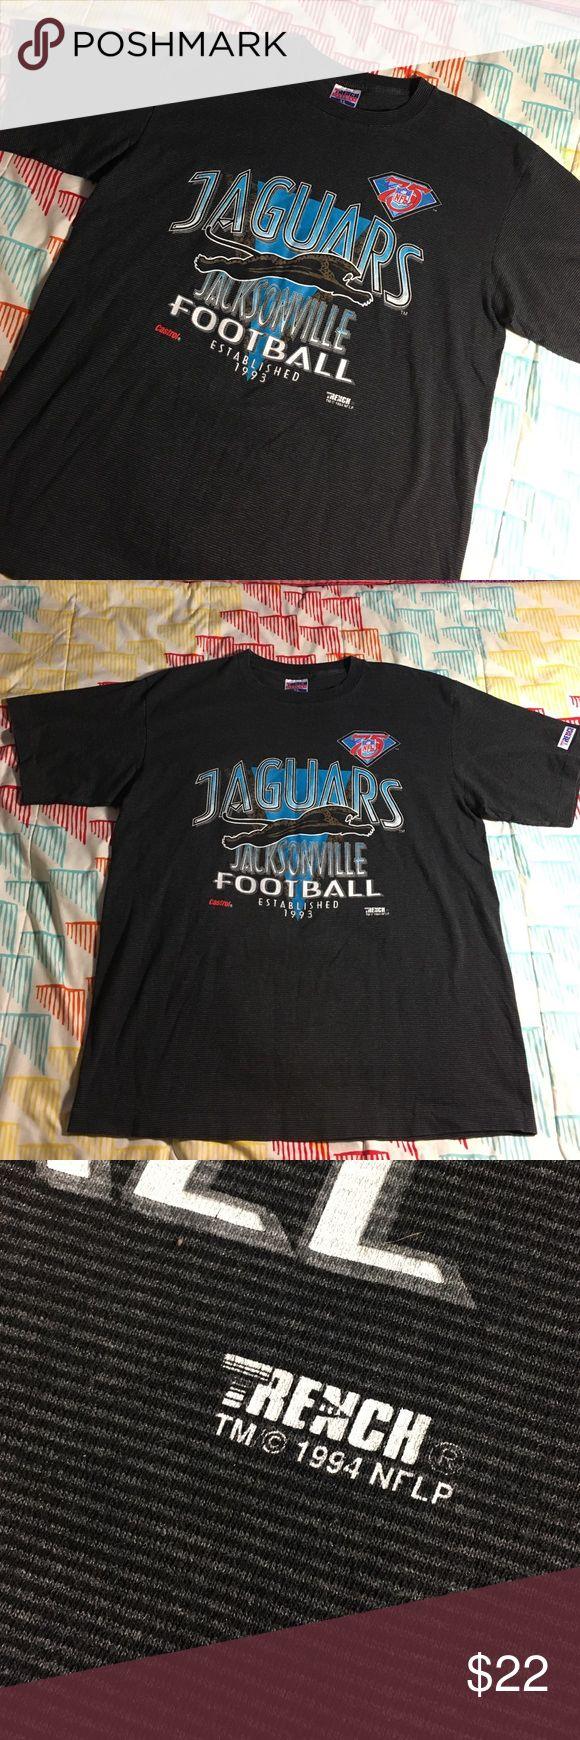 Shirt design jacksonville fl - Vintage 1994 Jacksonville Jaguars Football Shirt